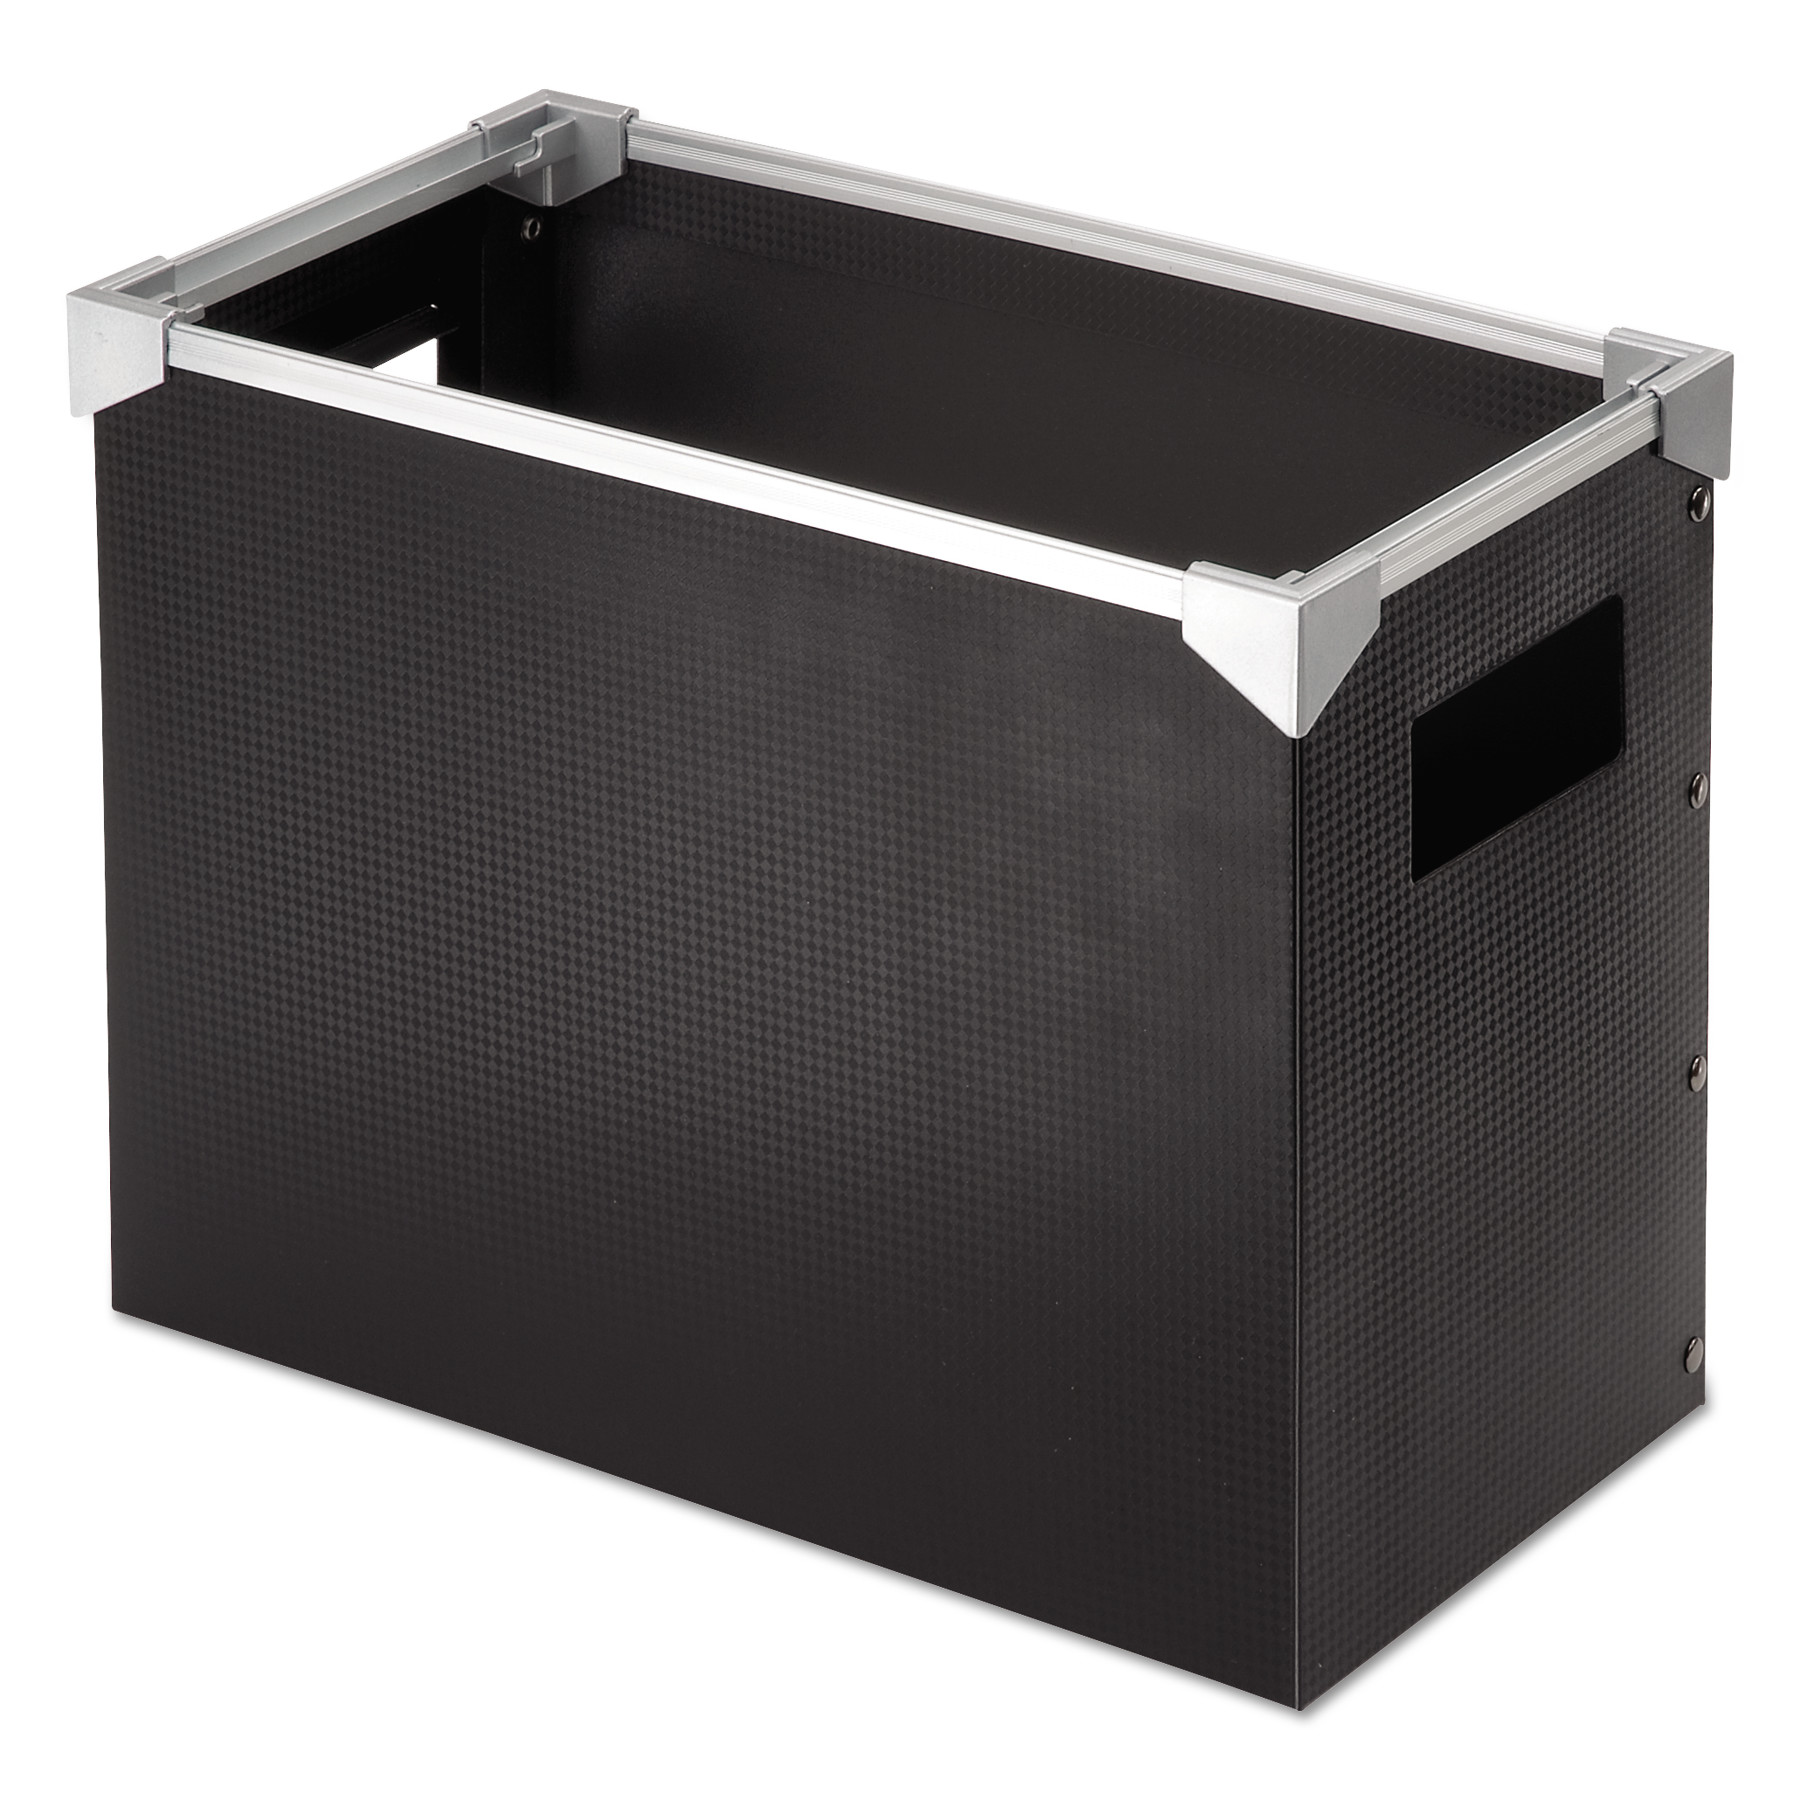 Poly Desktop Storage Box, Letter Size, Black - Goddess Products, Inc